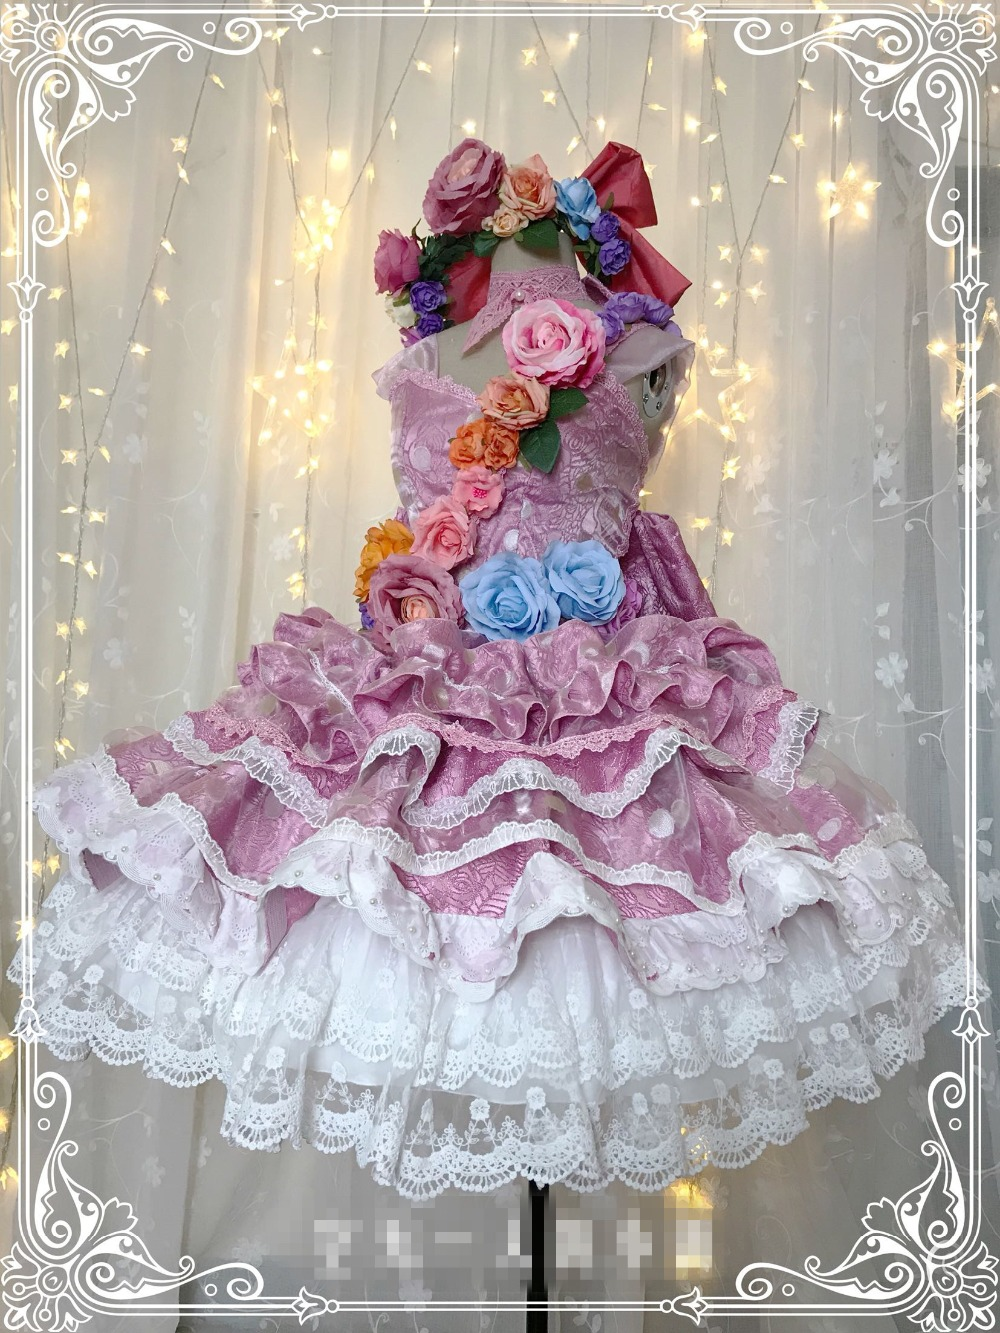 NERO Fate/EXTELLA Anime cosplay nero cosplay costume dress female custom made/size 2